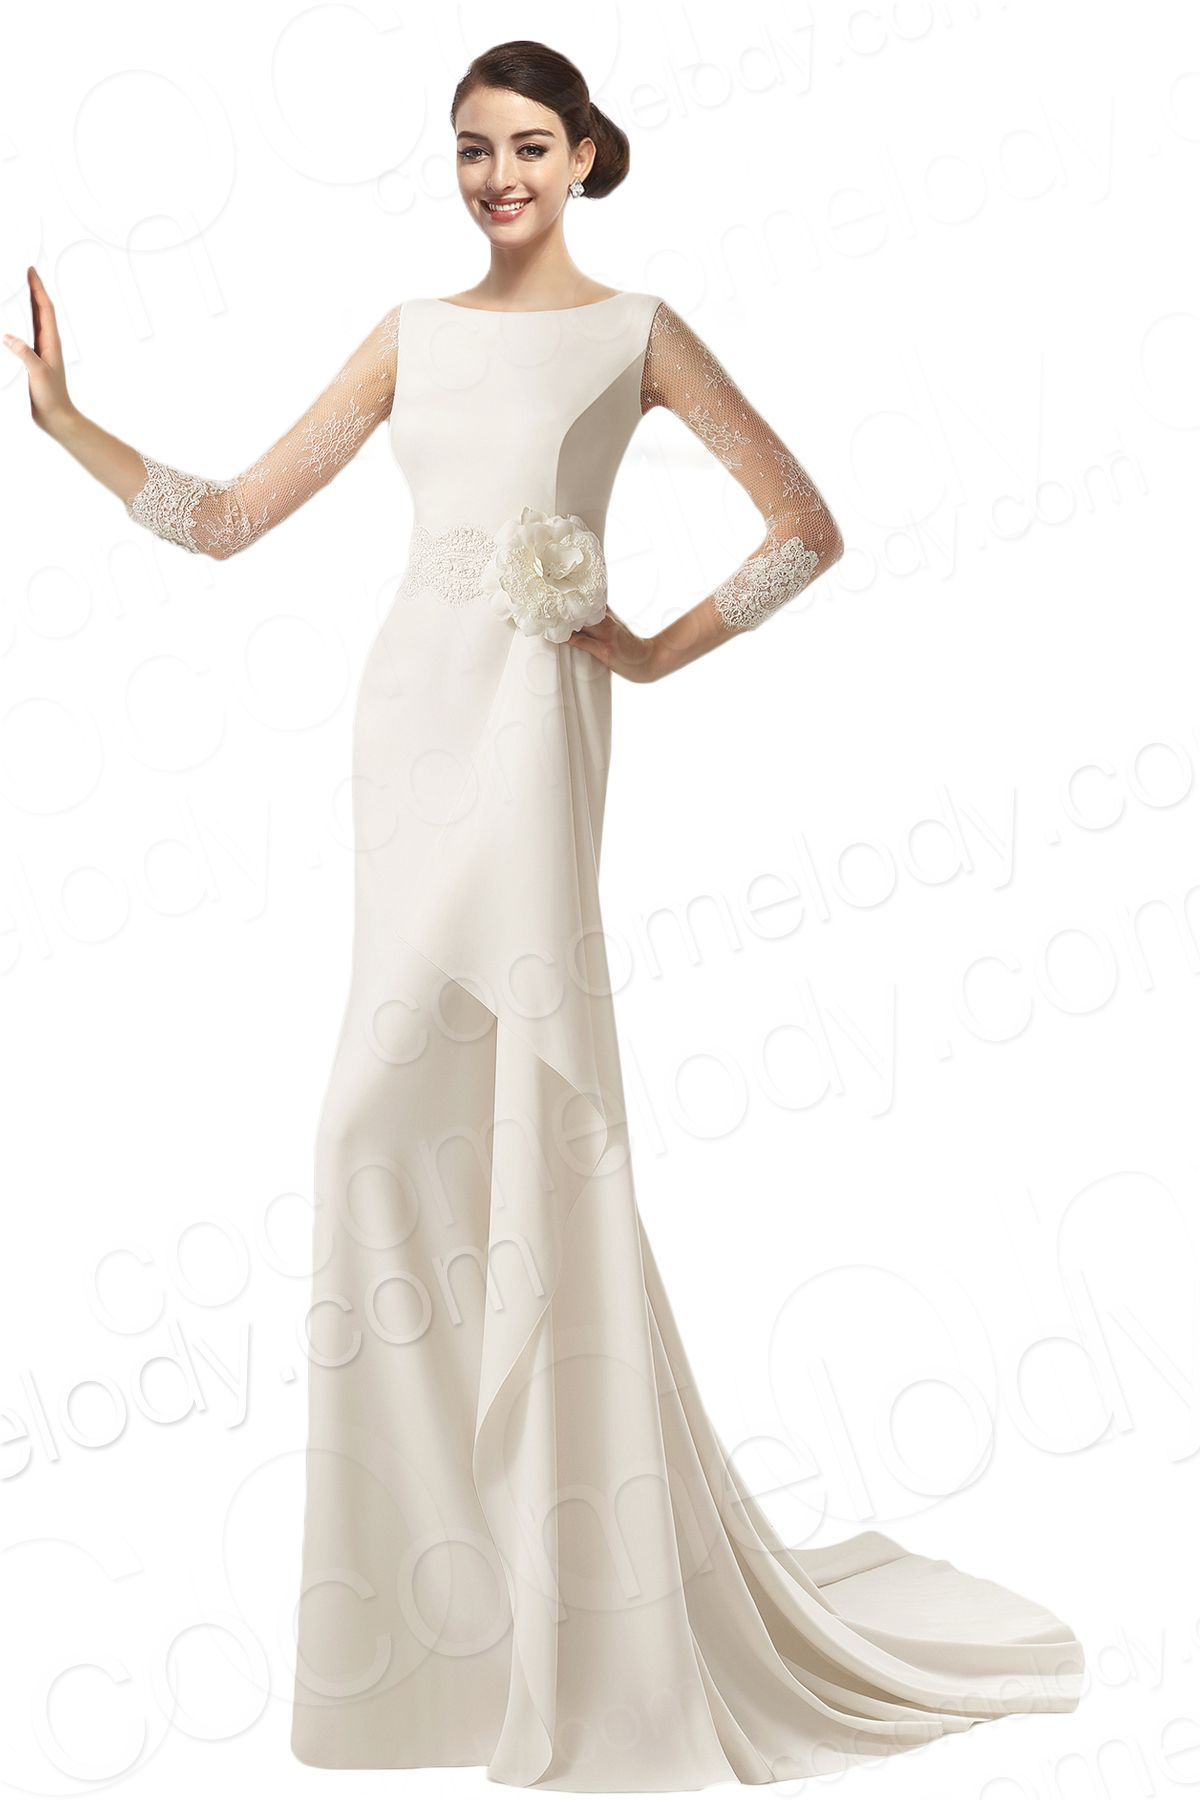 Long sleeve ivory wedding dress  ClassicSheathColumnBateauNaturalTrainSatinIvoryLongSleeve